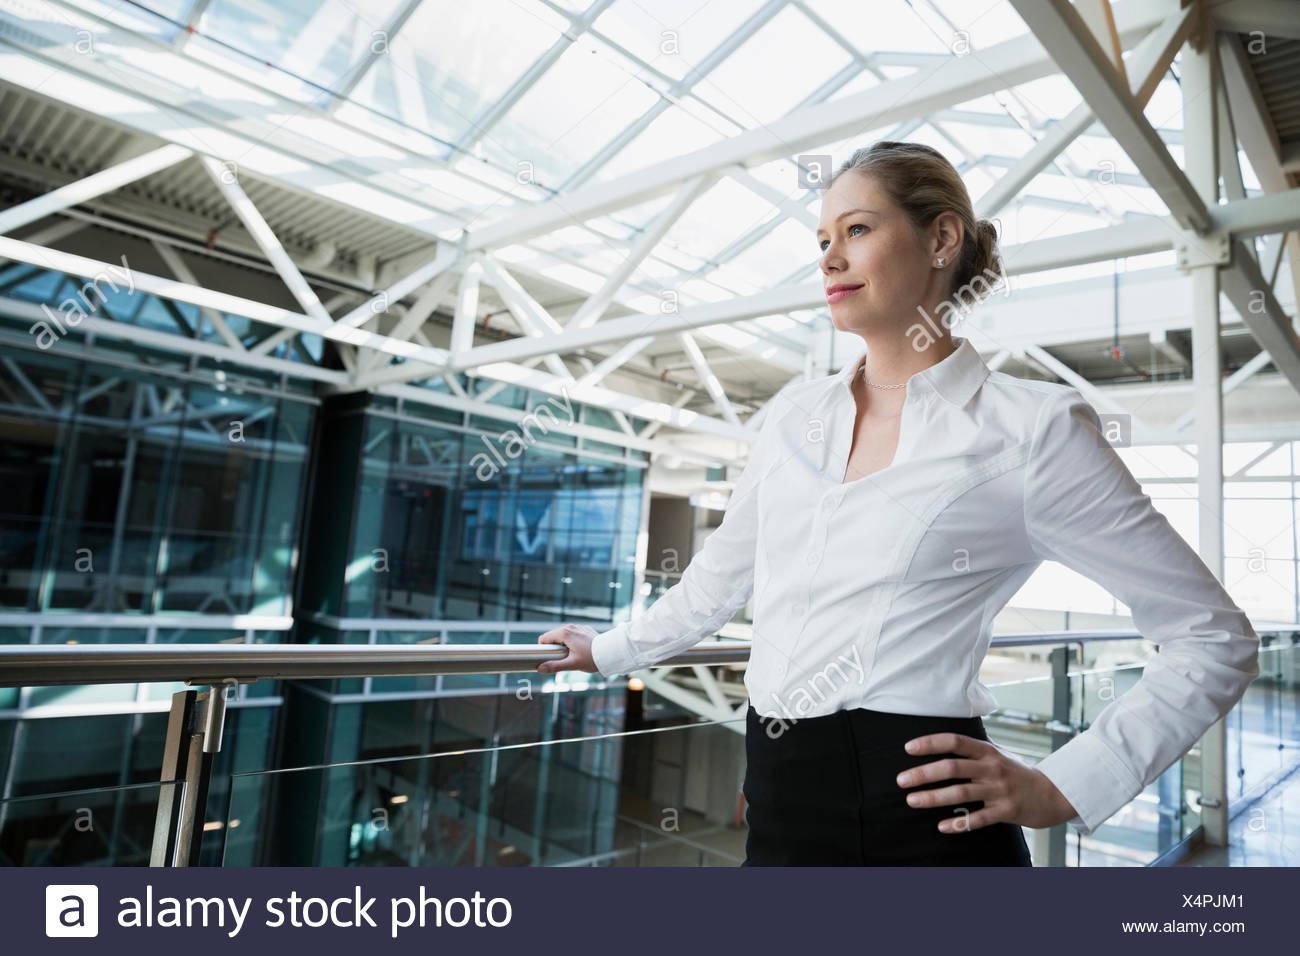 Confident businesswoman looking away in atrium - Stock Image